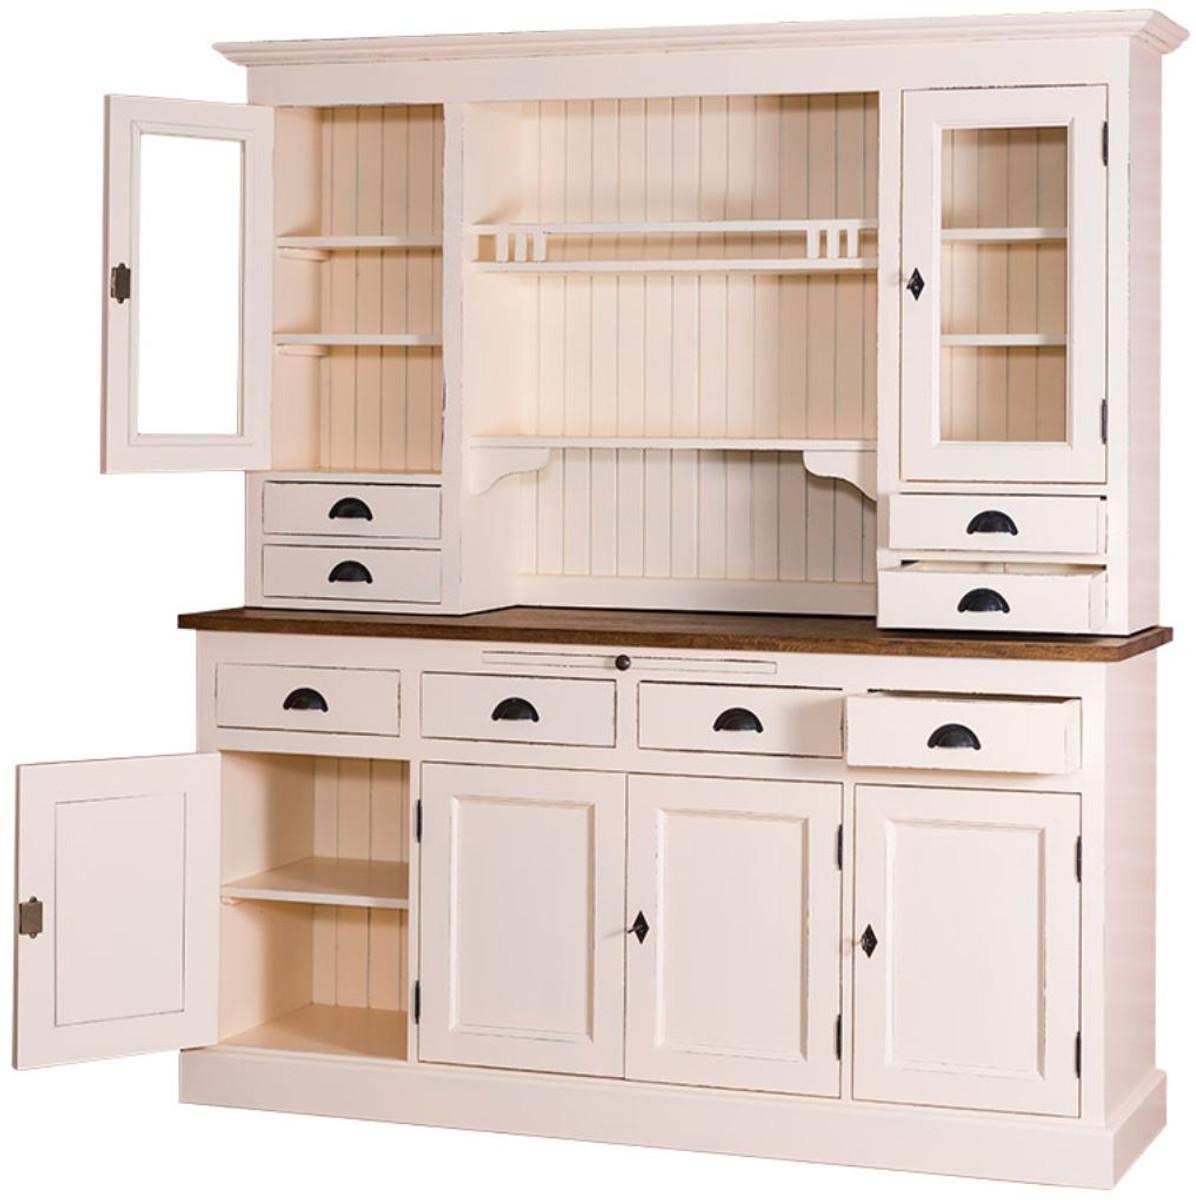 casa padrino landhausstil k chenschrank antik cremefarben braun 179 x 50 x h 197 cm 2. Black Bedroom Furniture Sets. Home Design Ideas